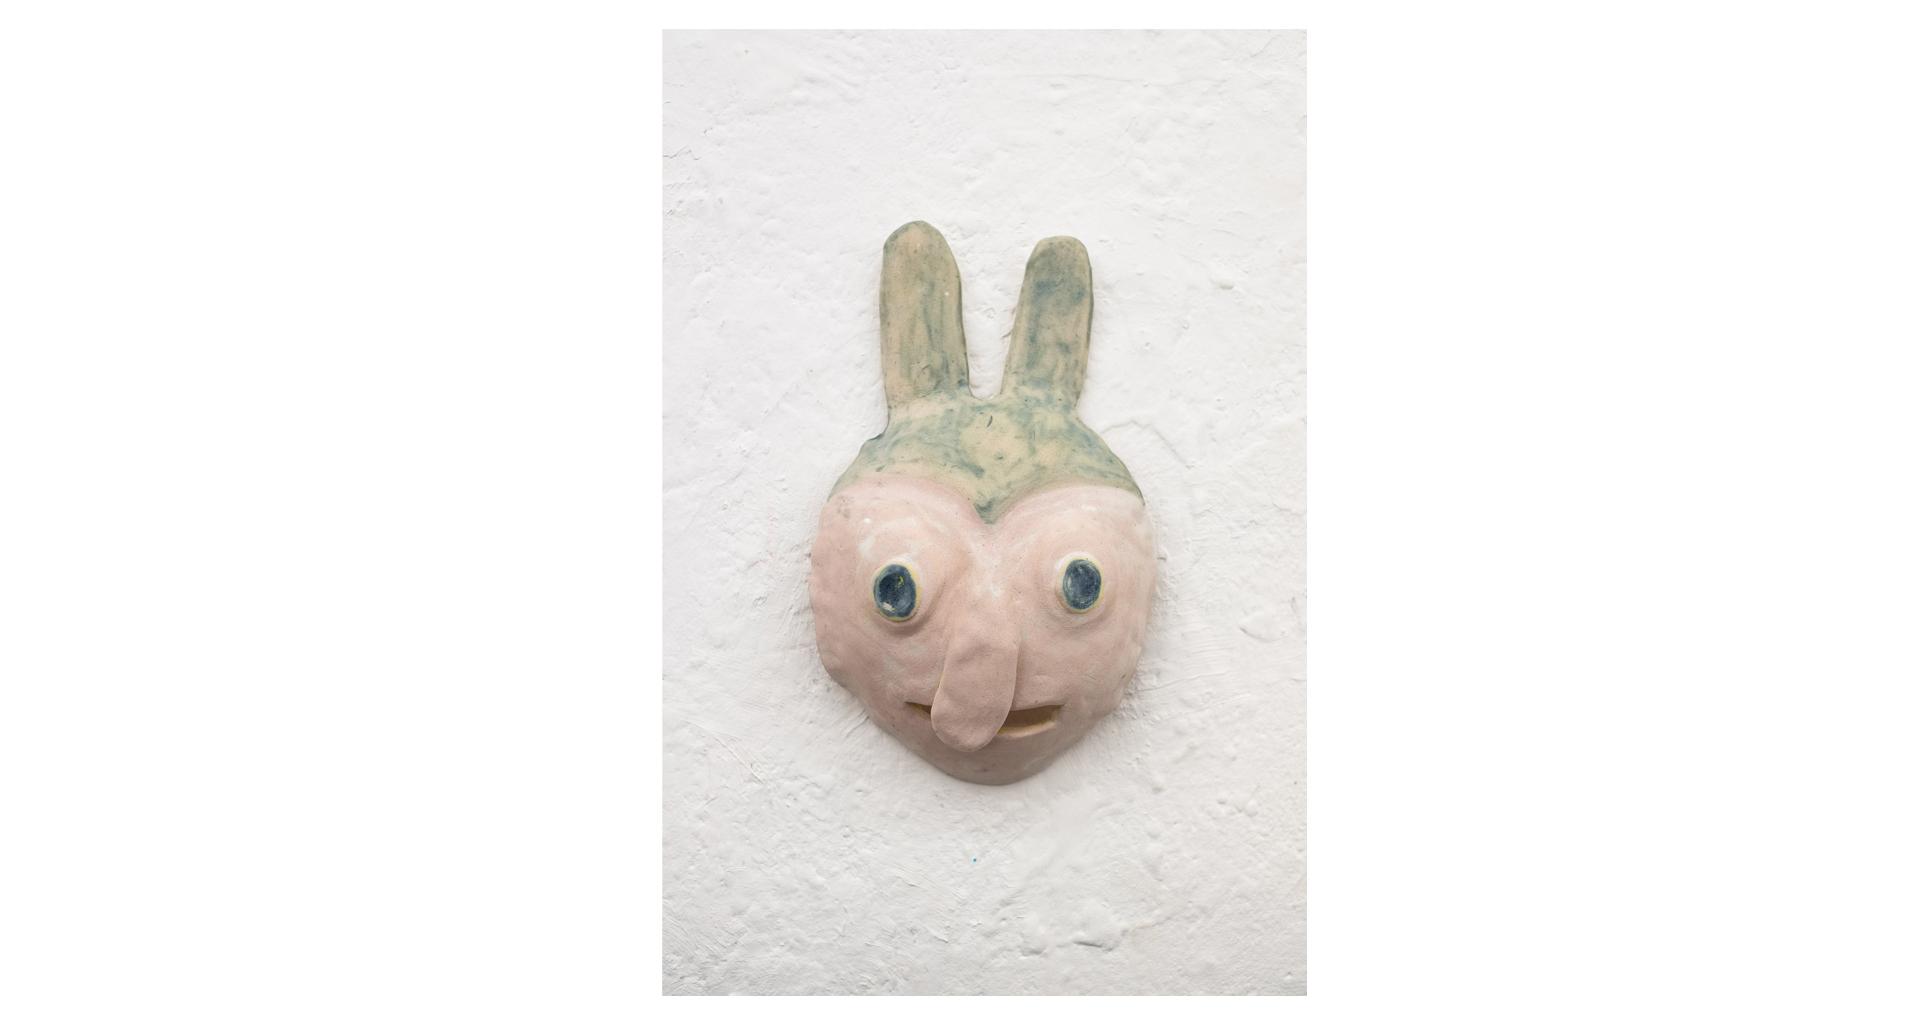 juliaboehme julia boehme studio goof studiogoof ceramics pottery keramik töpferei